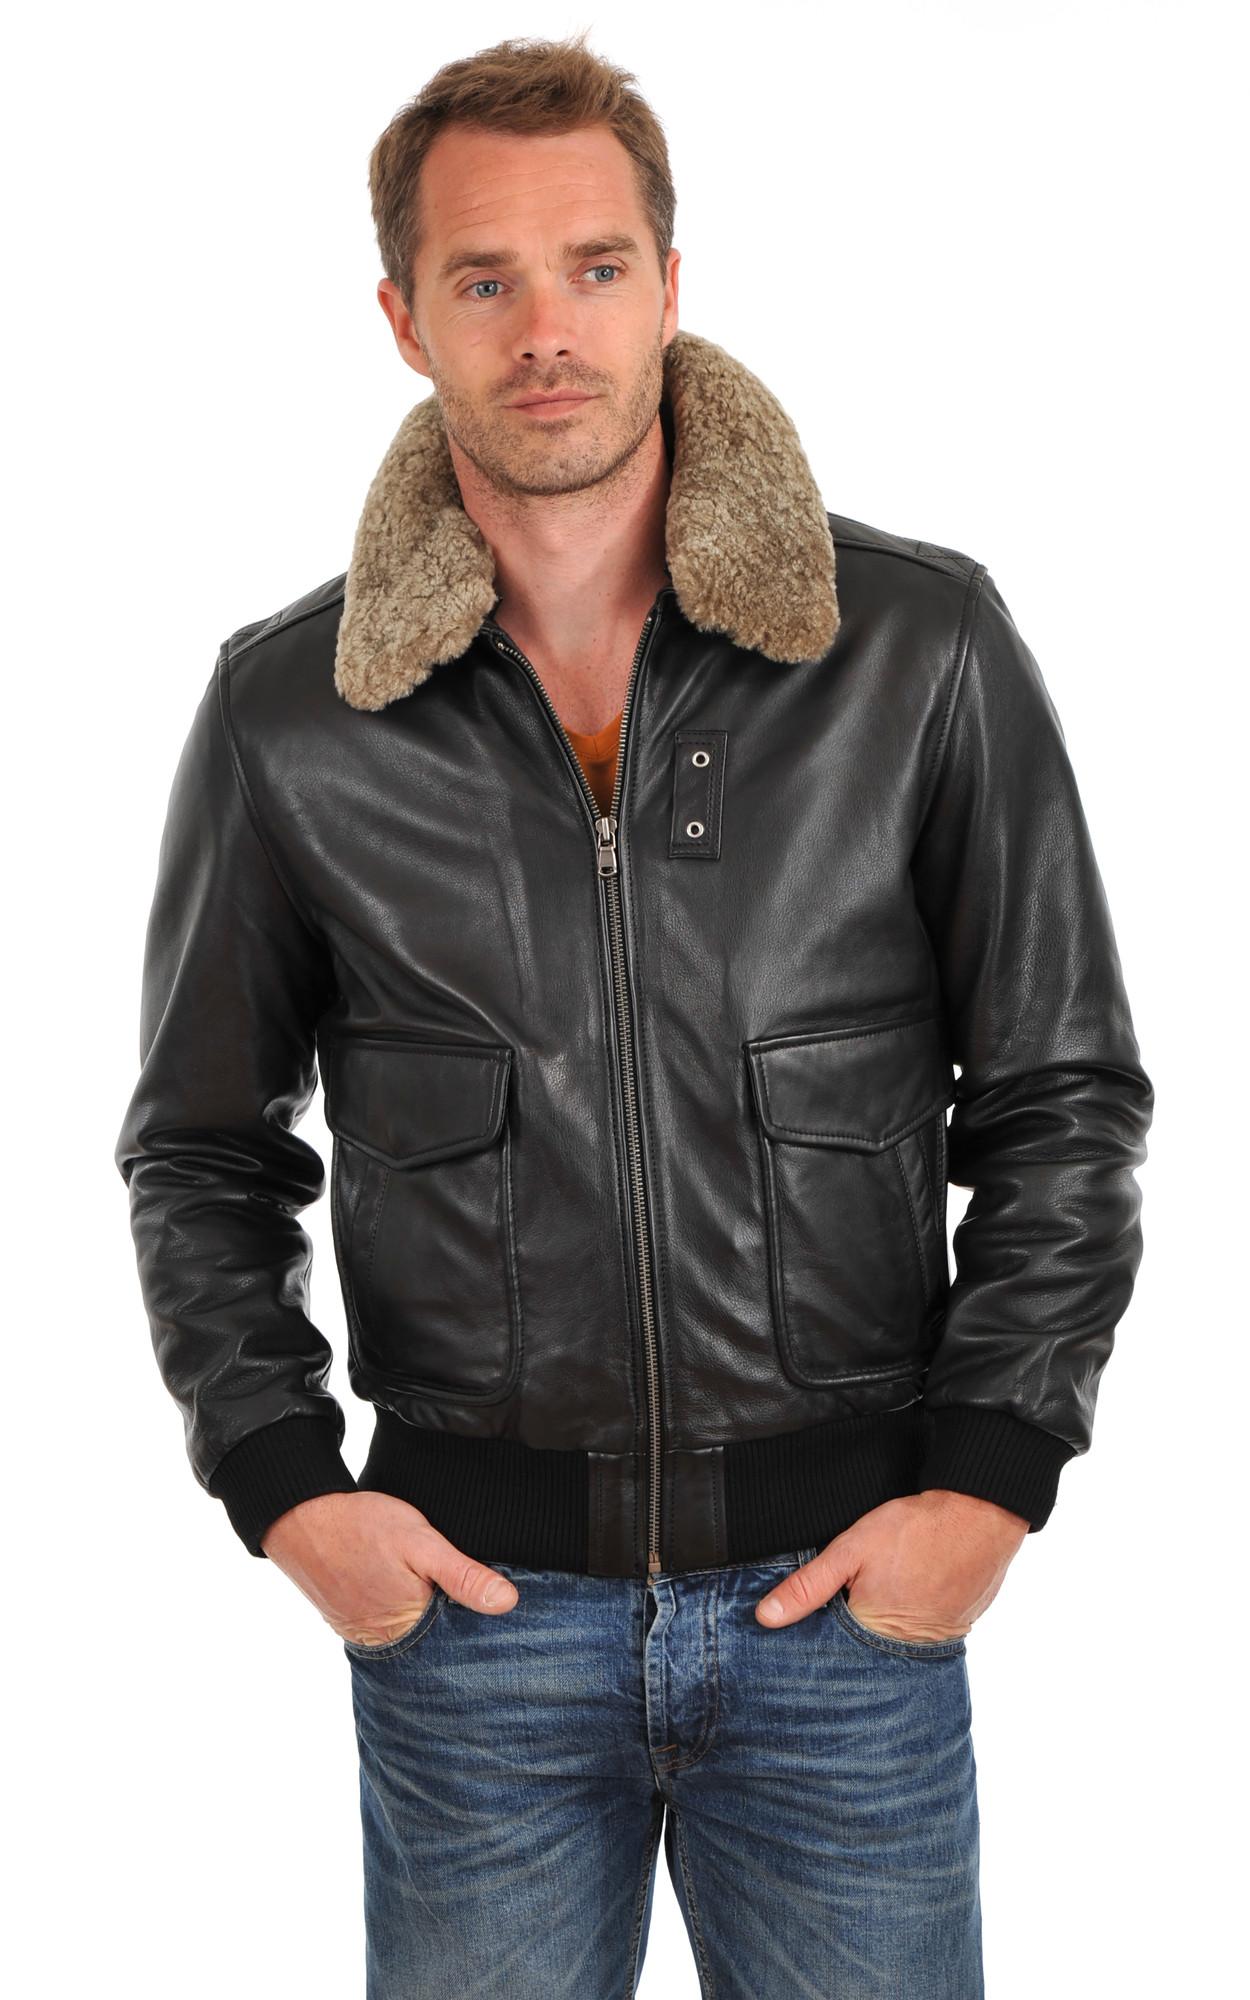 Choisir sa taille veste en cuir